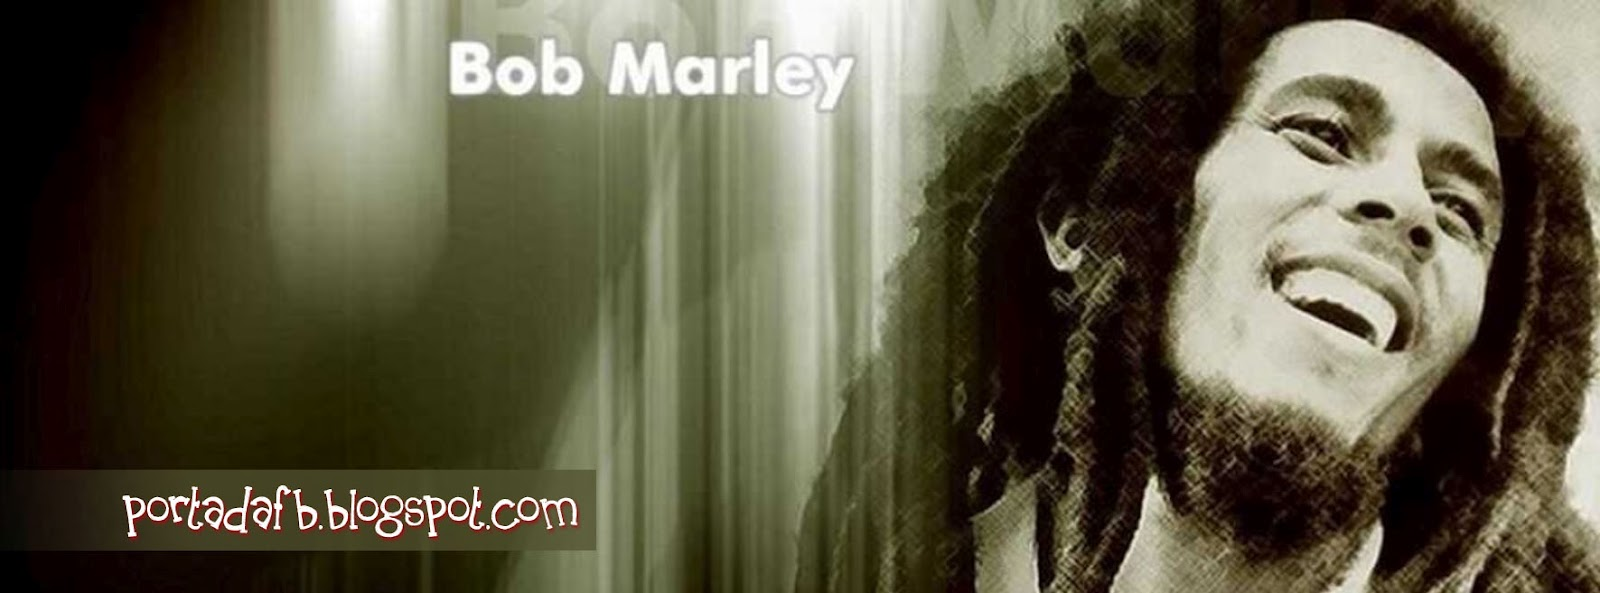 portada facebook - bob marley